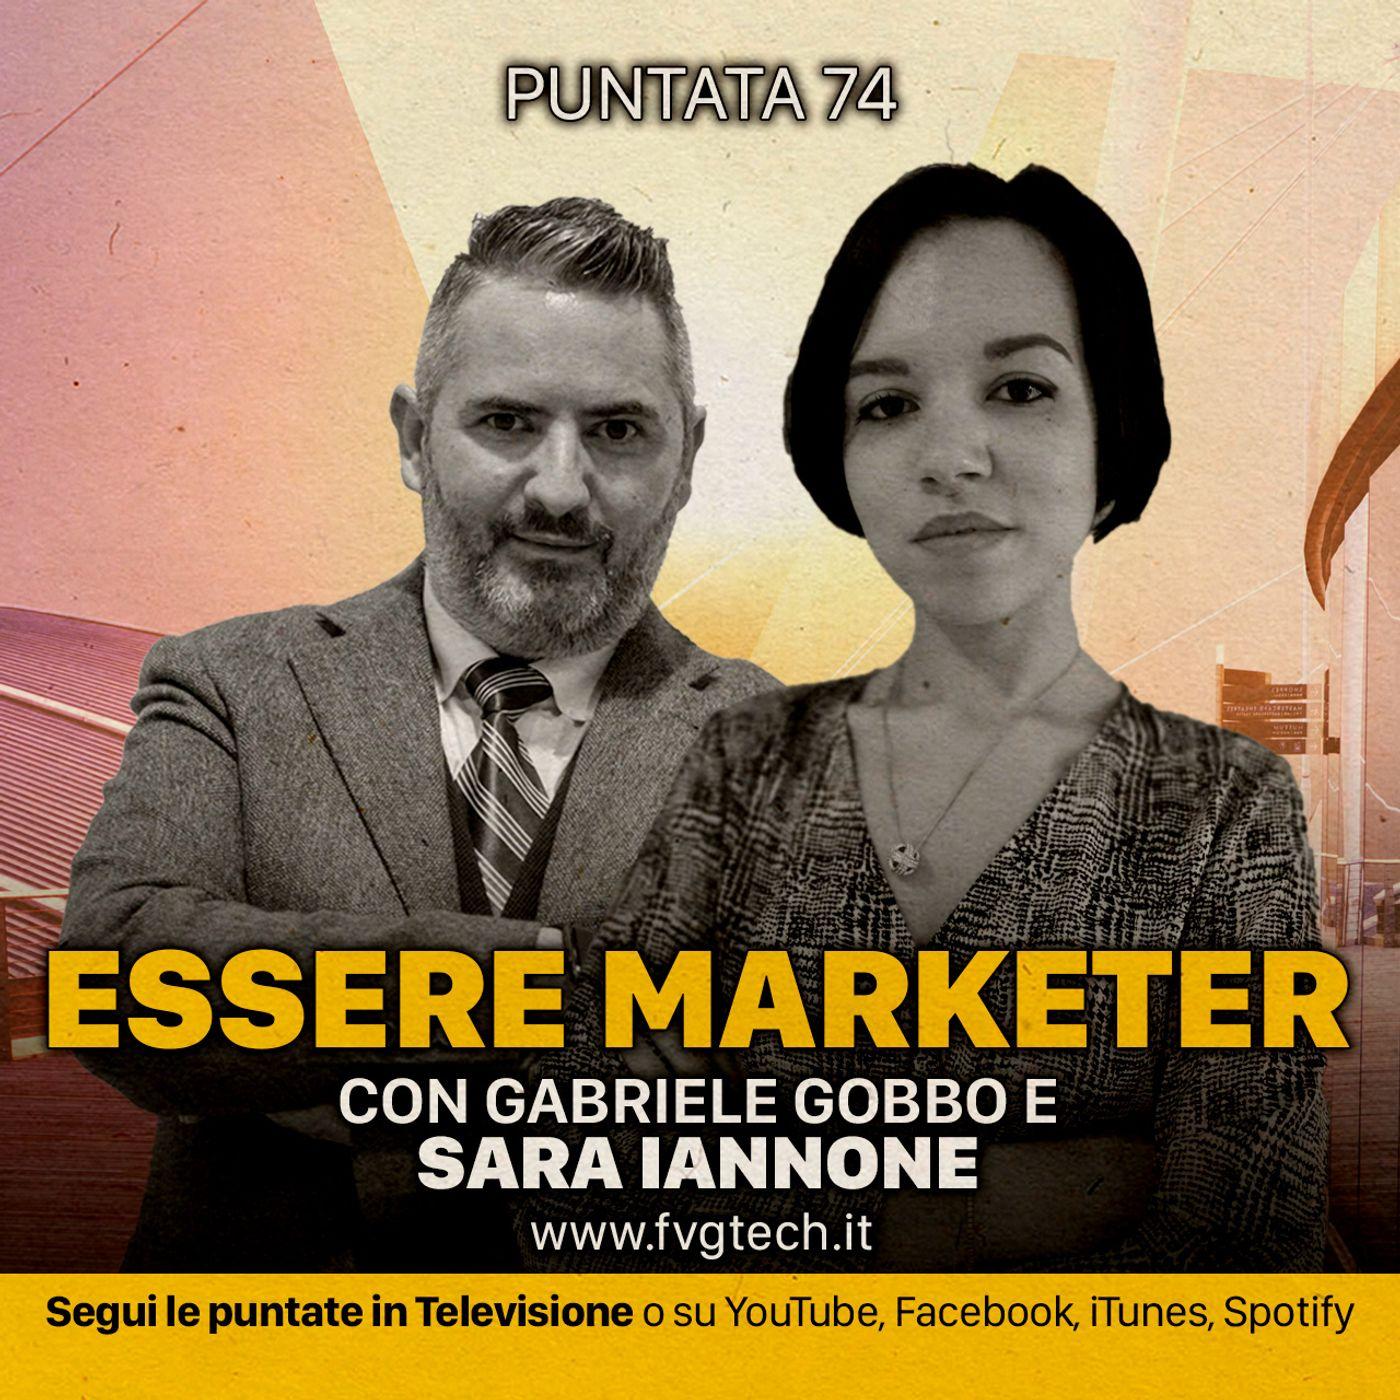 74 - Essere digital marketer. Ospite Sara Iannone